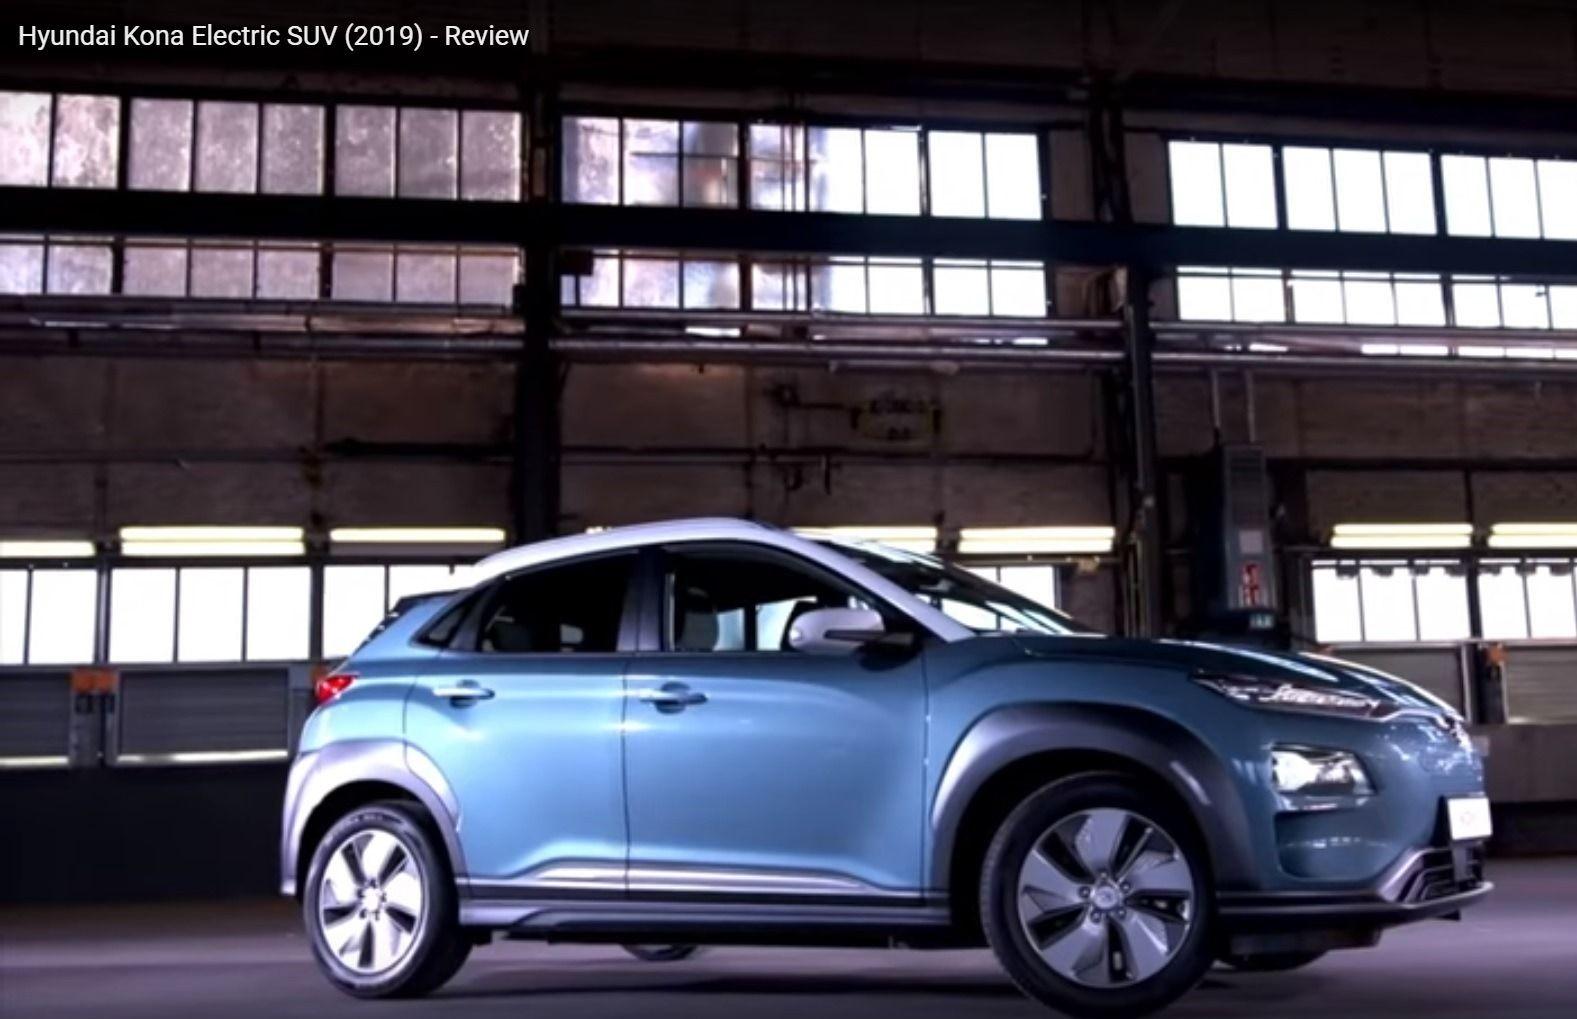 Hyundai Kona Electric SUV (2019). The base model has 186